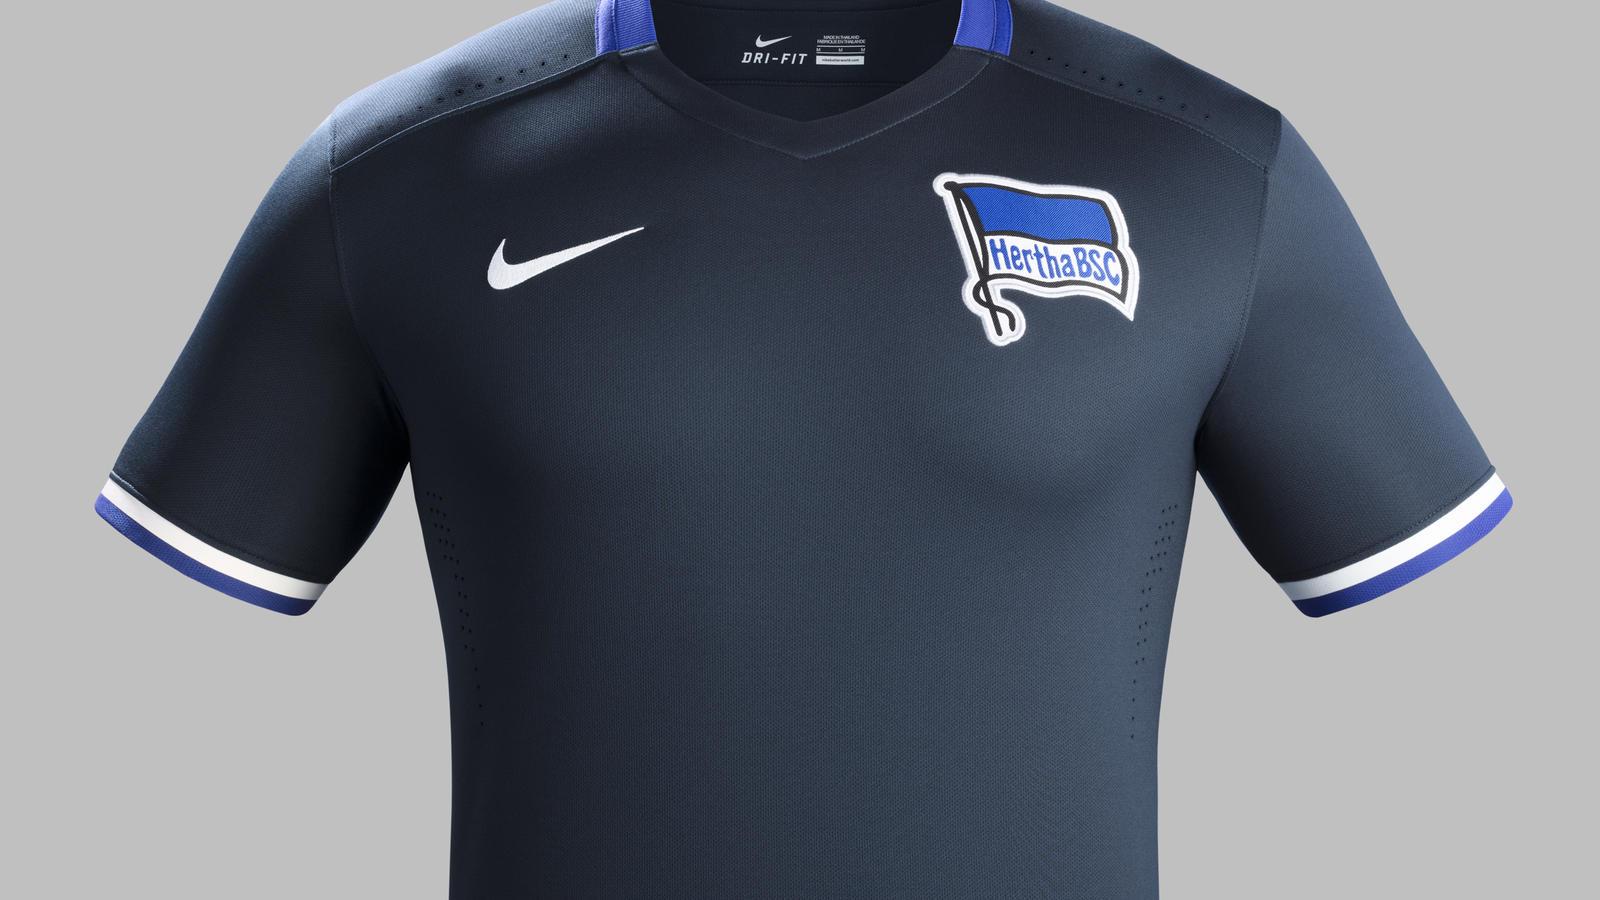 ac219ebe1 Fa15 Club Kits PR Match Front A Hertha Berlin R. Hertha BSC Berlin 2015-16  away kit. Fa15 Club Kits PR Match Venting A Hertha Berlin R